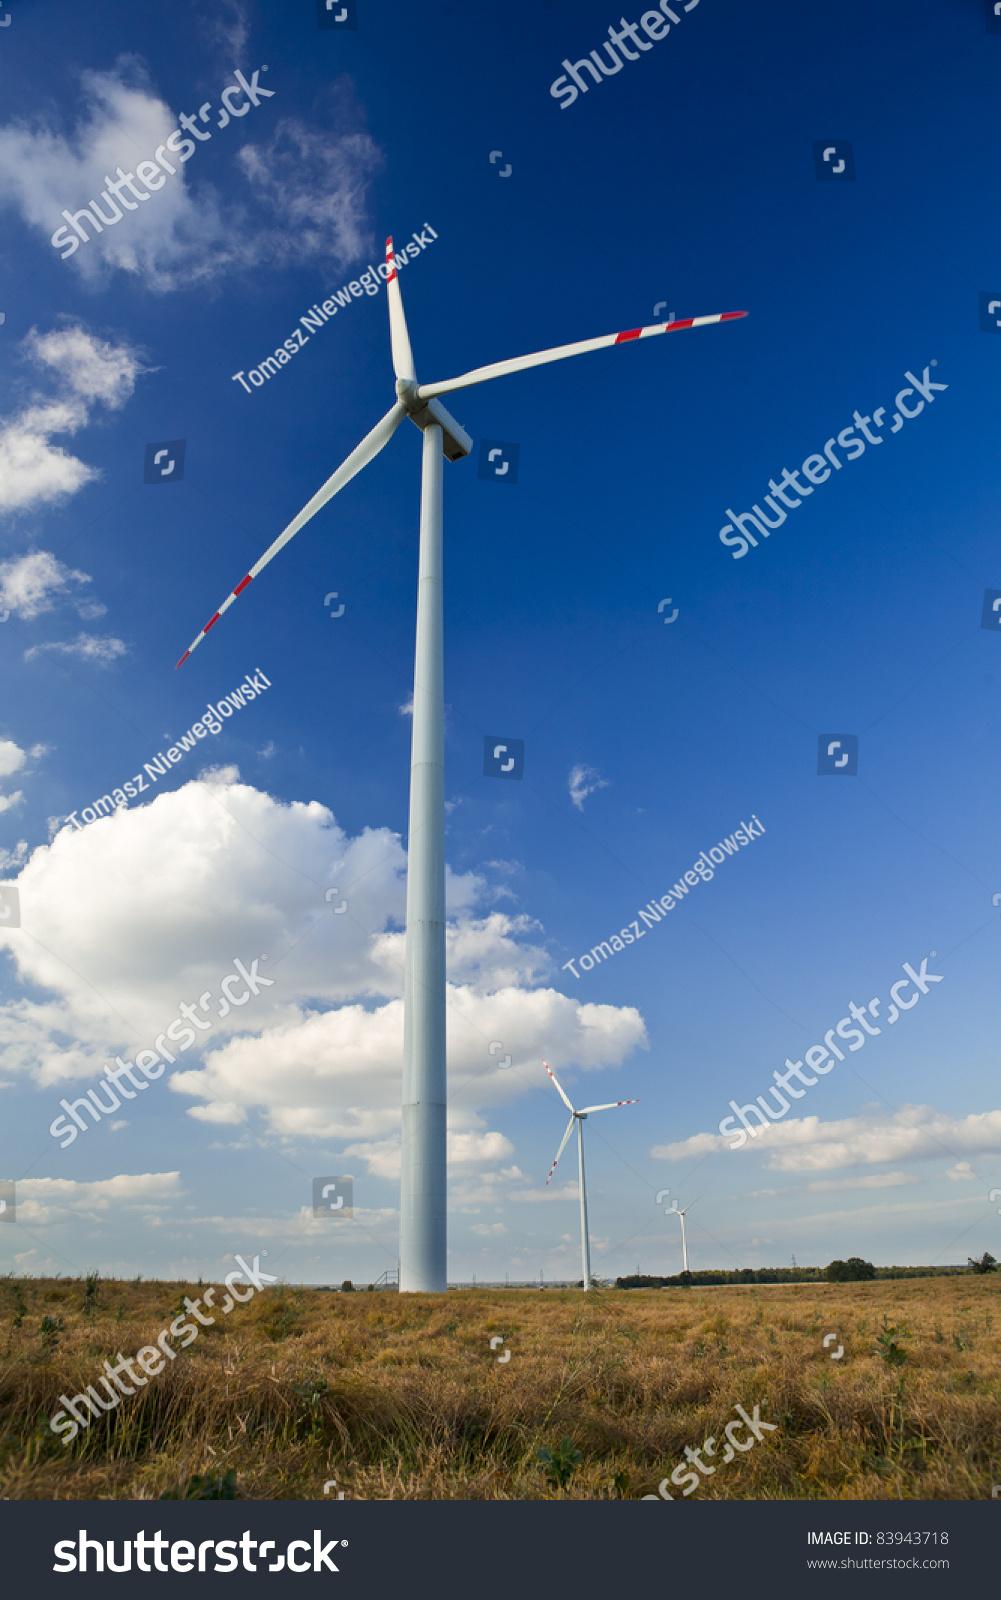 Wind Turbines. Alternative Energy Source. Stock Photo 83943718 ...